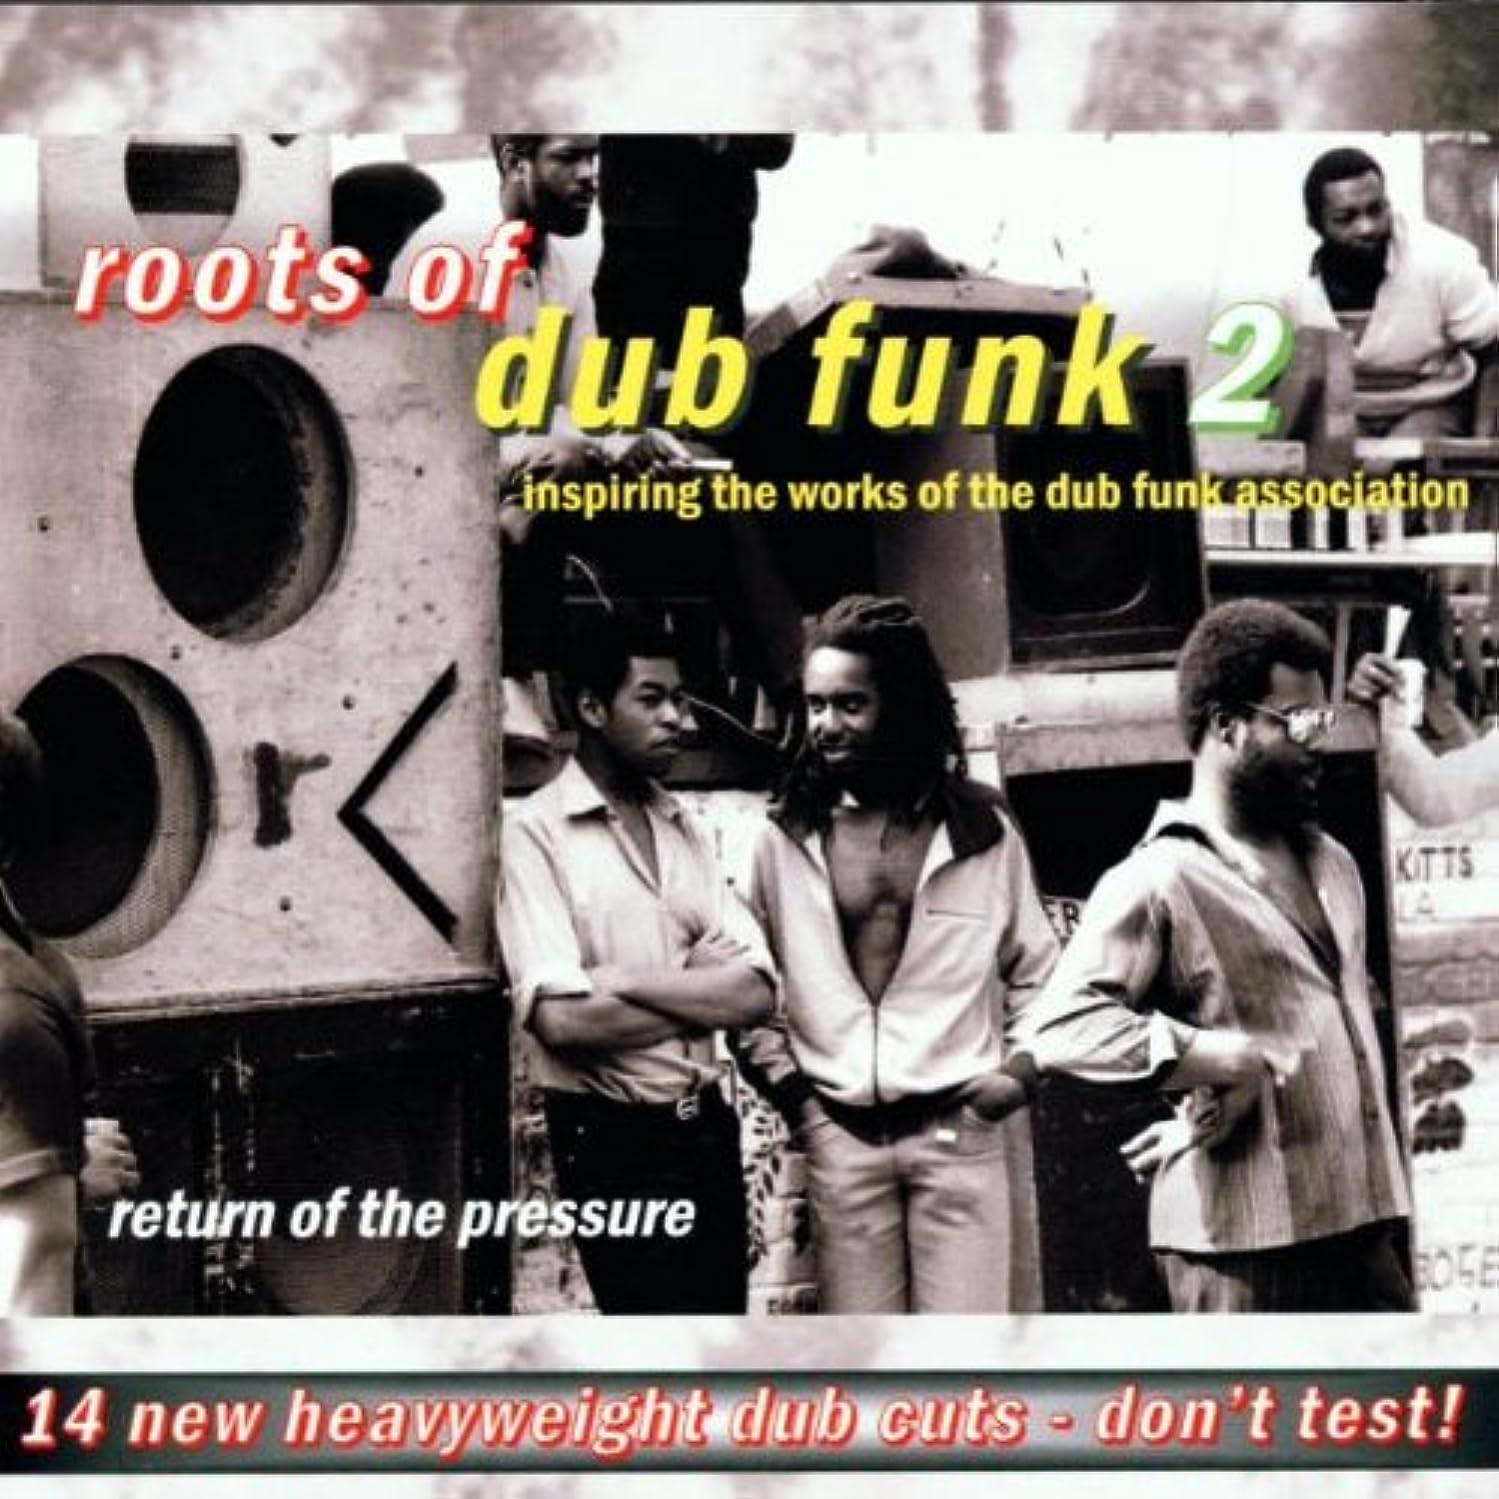 Roots of Dub Funk 2: Return of the Pressure